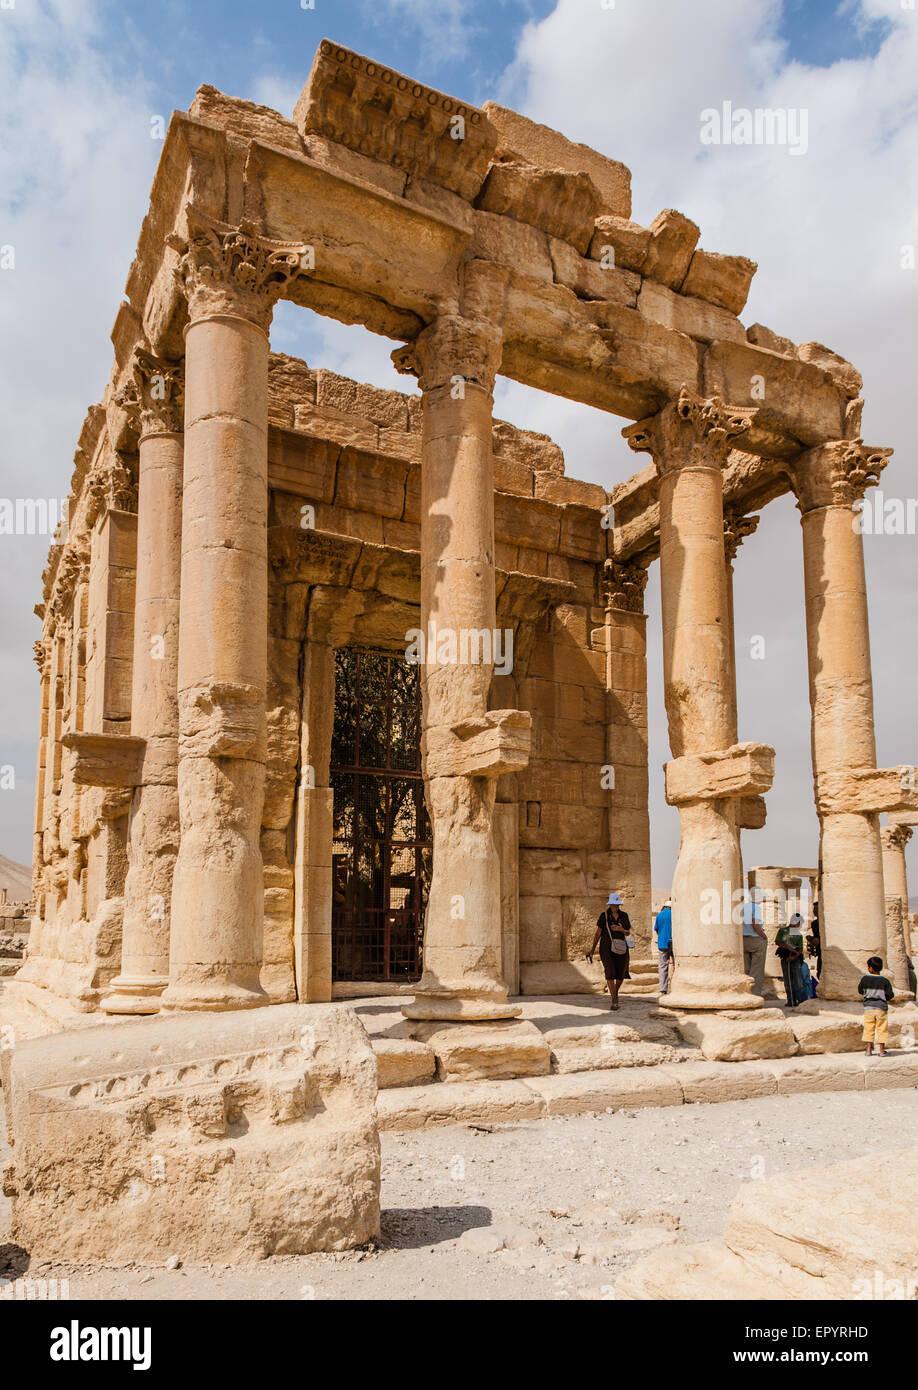 Temple of Baal Shamin - Stock Image